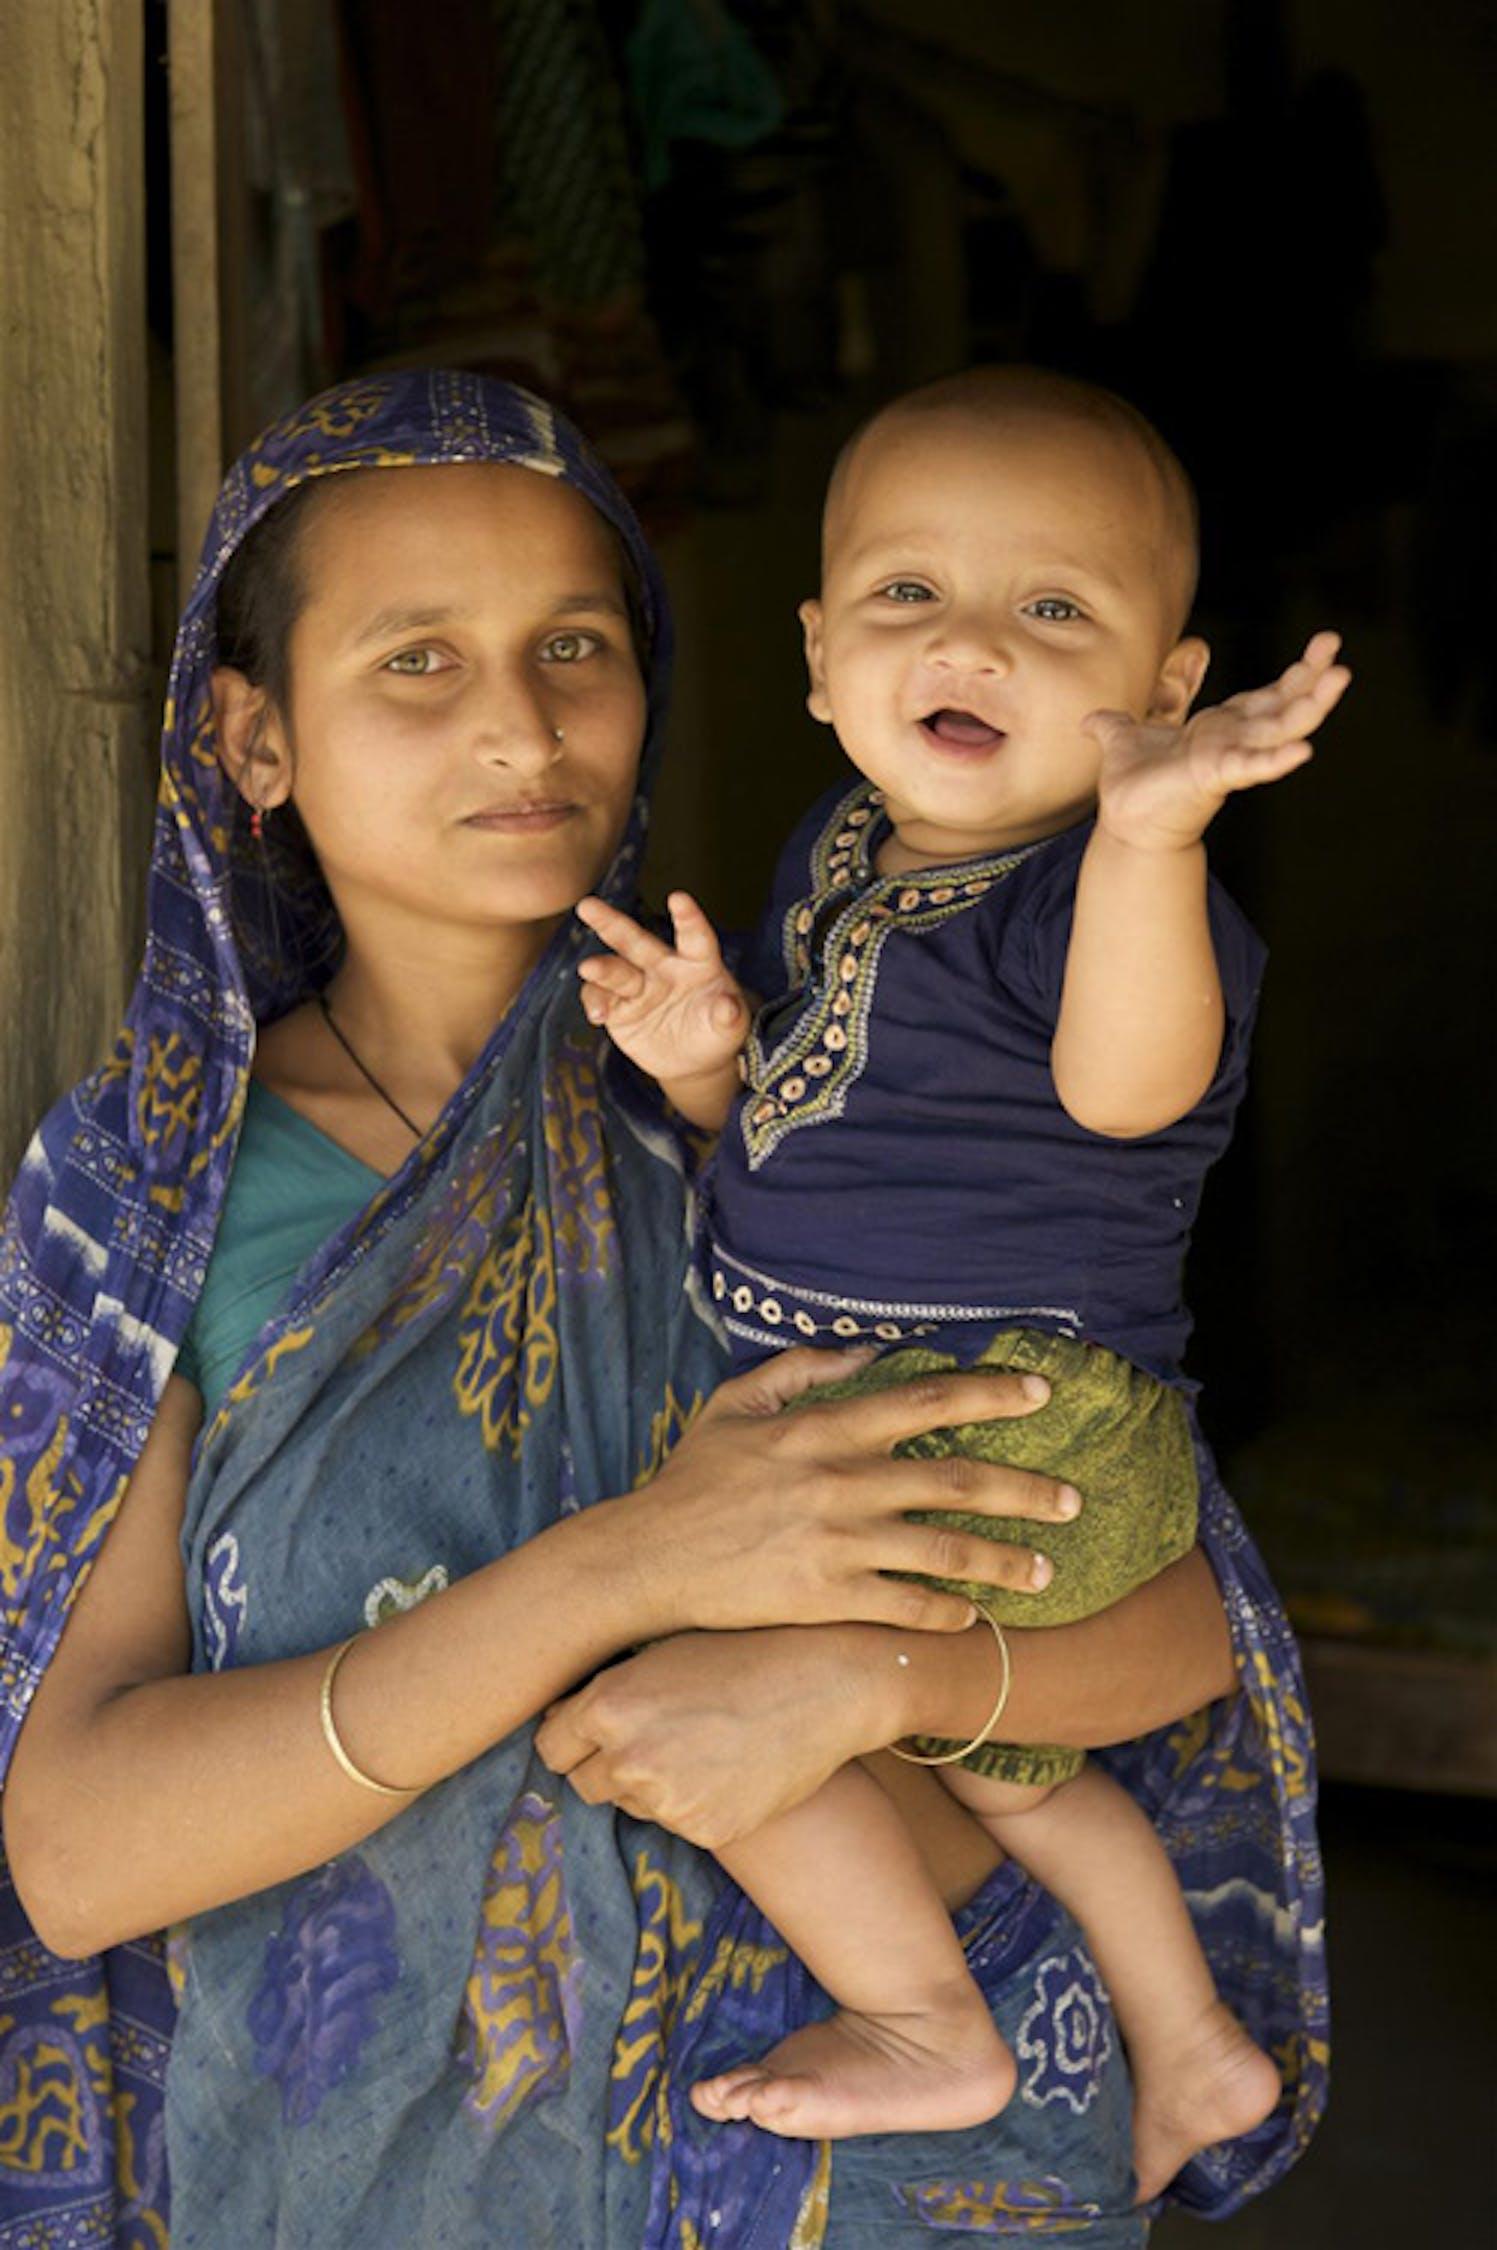 Bangladesh - ©UNICEF/NYHQ2009-0600/Noorani